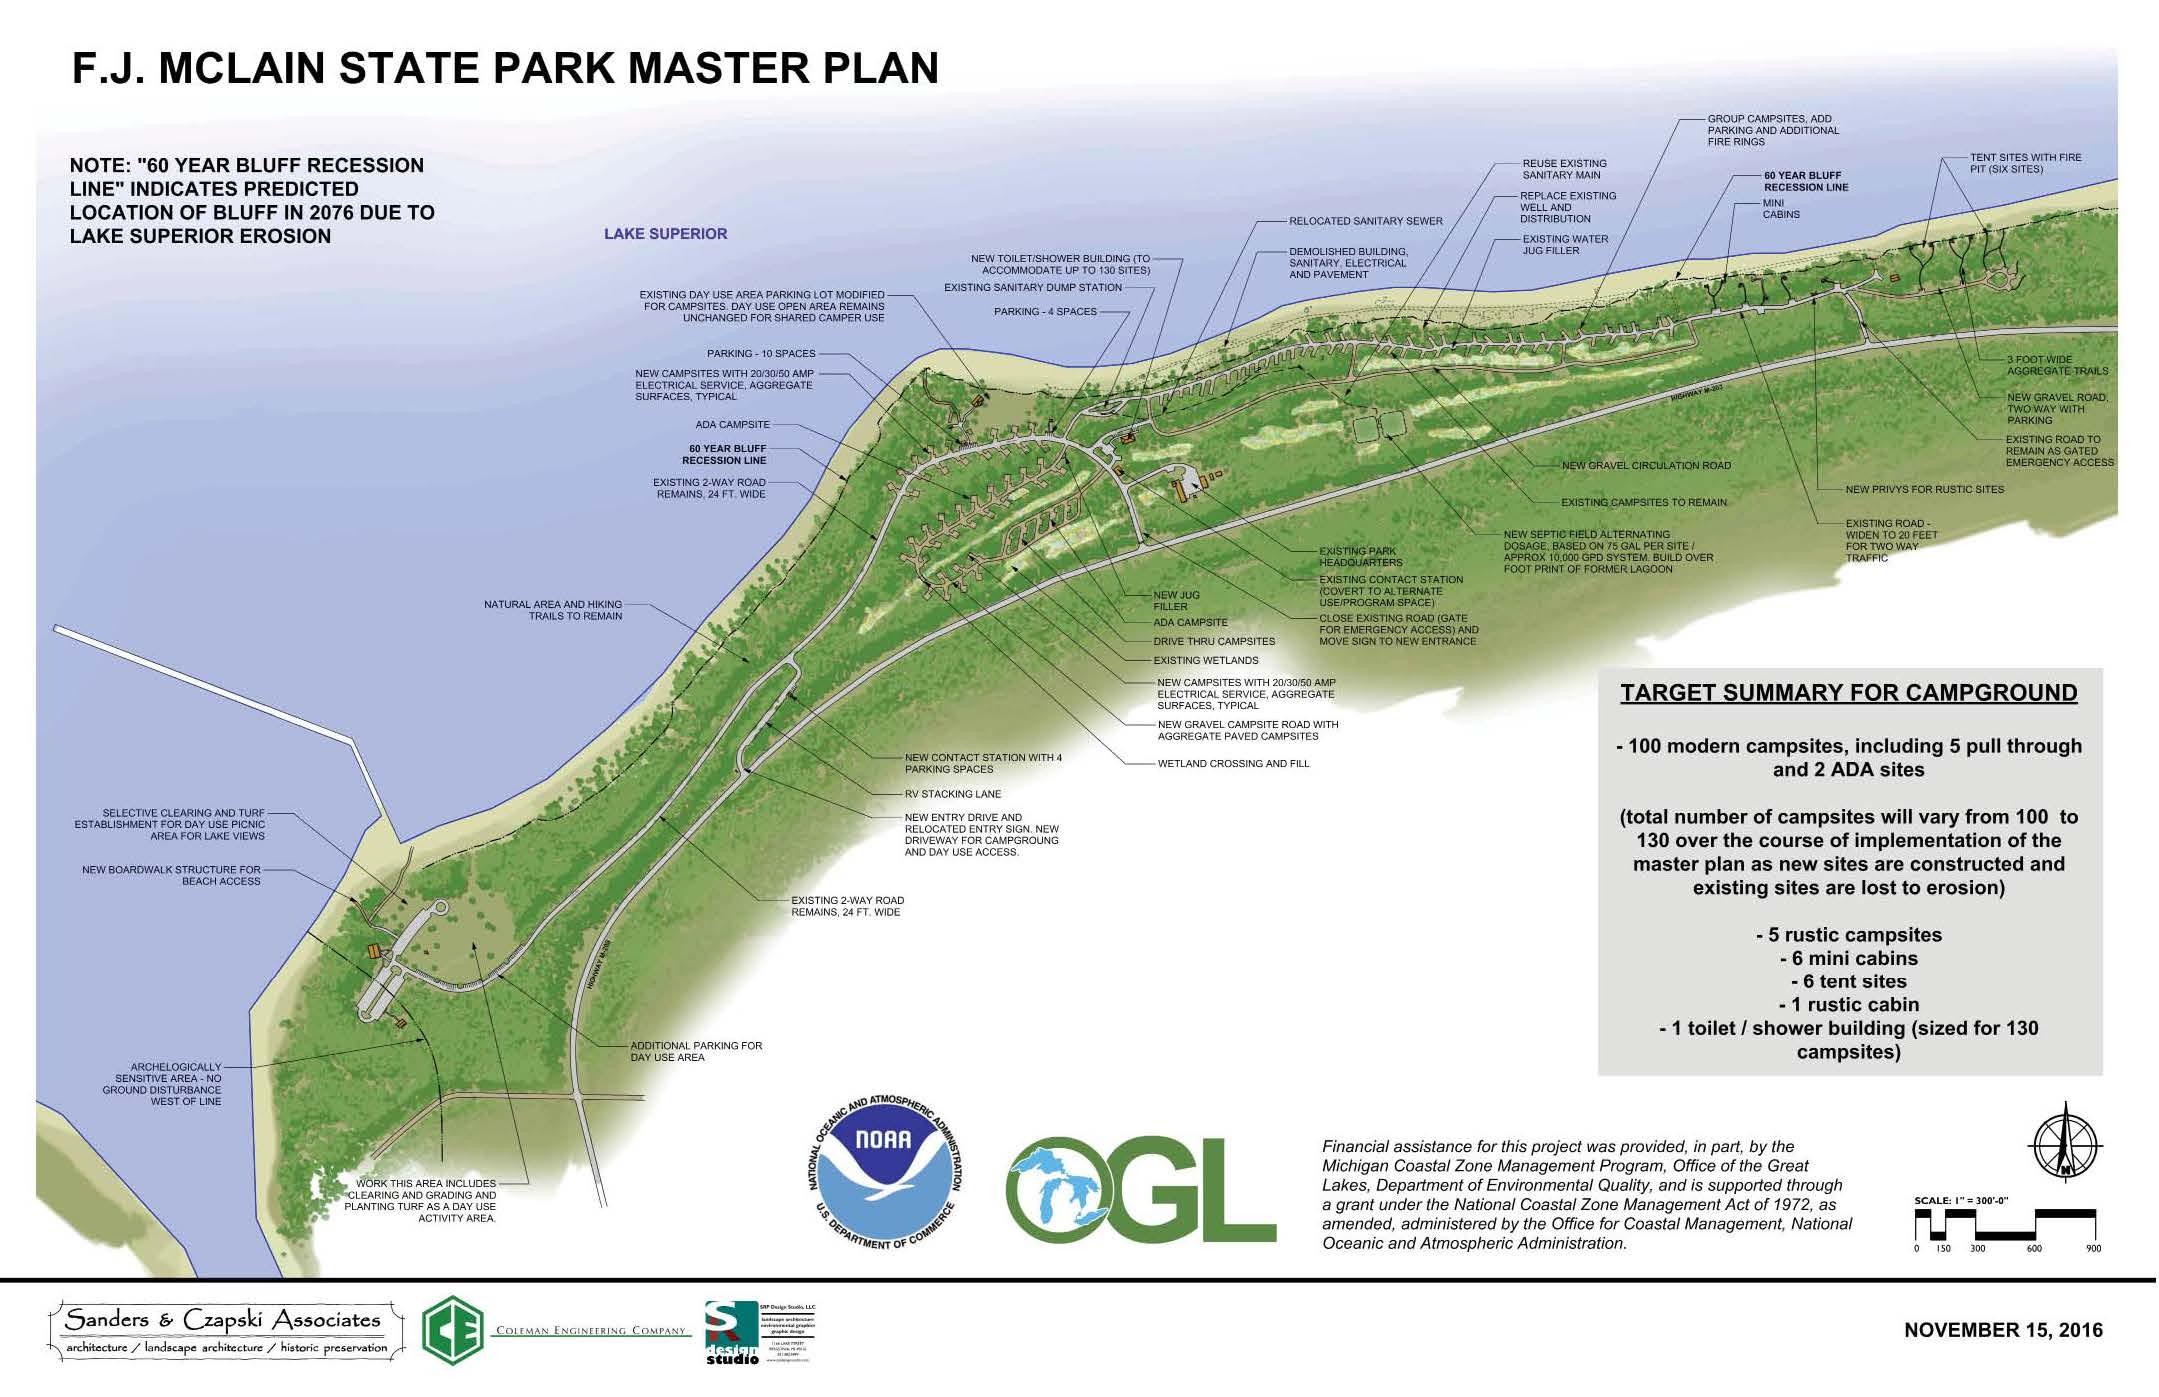 DNR  DNR finalizes master plan for FJ McLain State Park